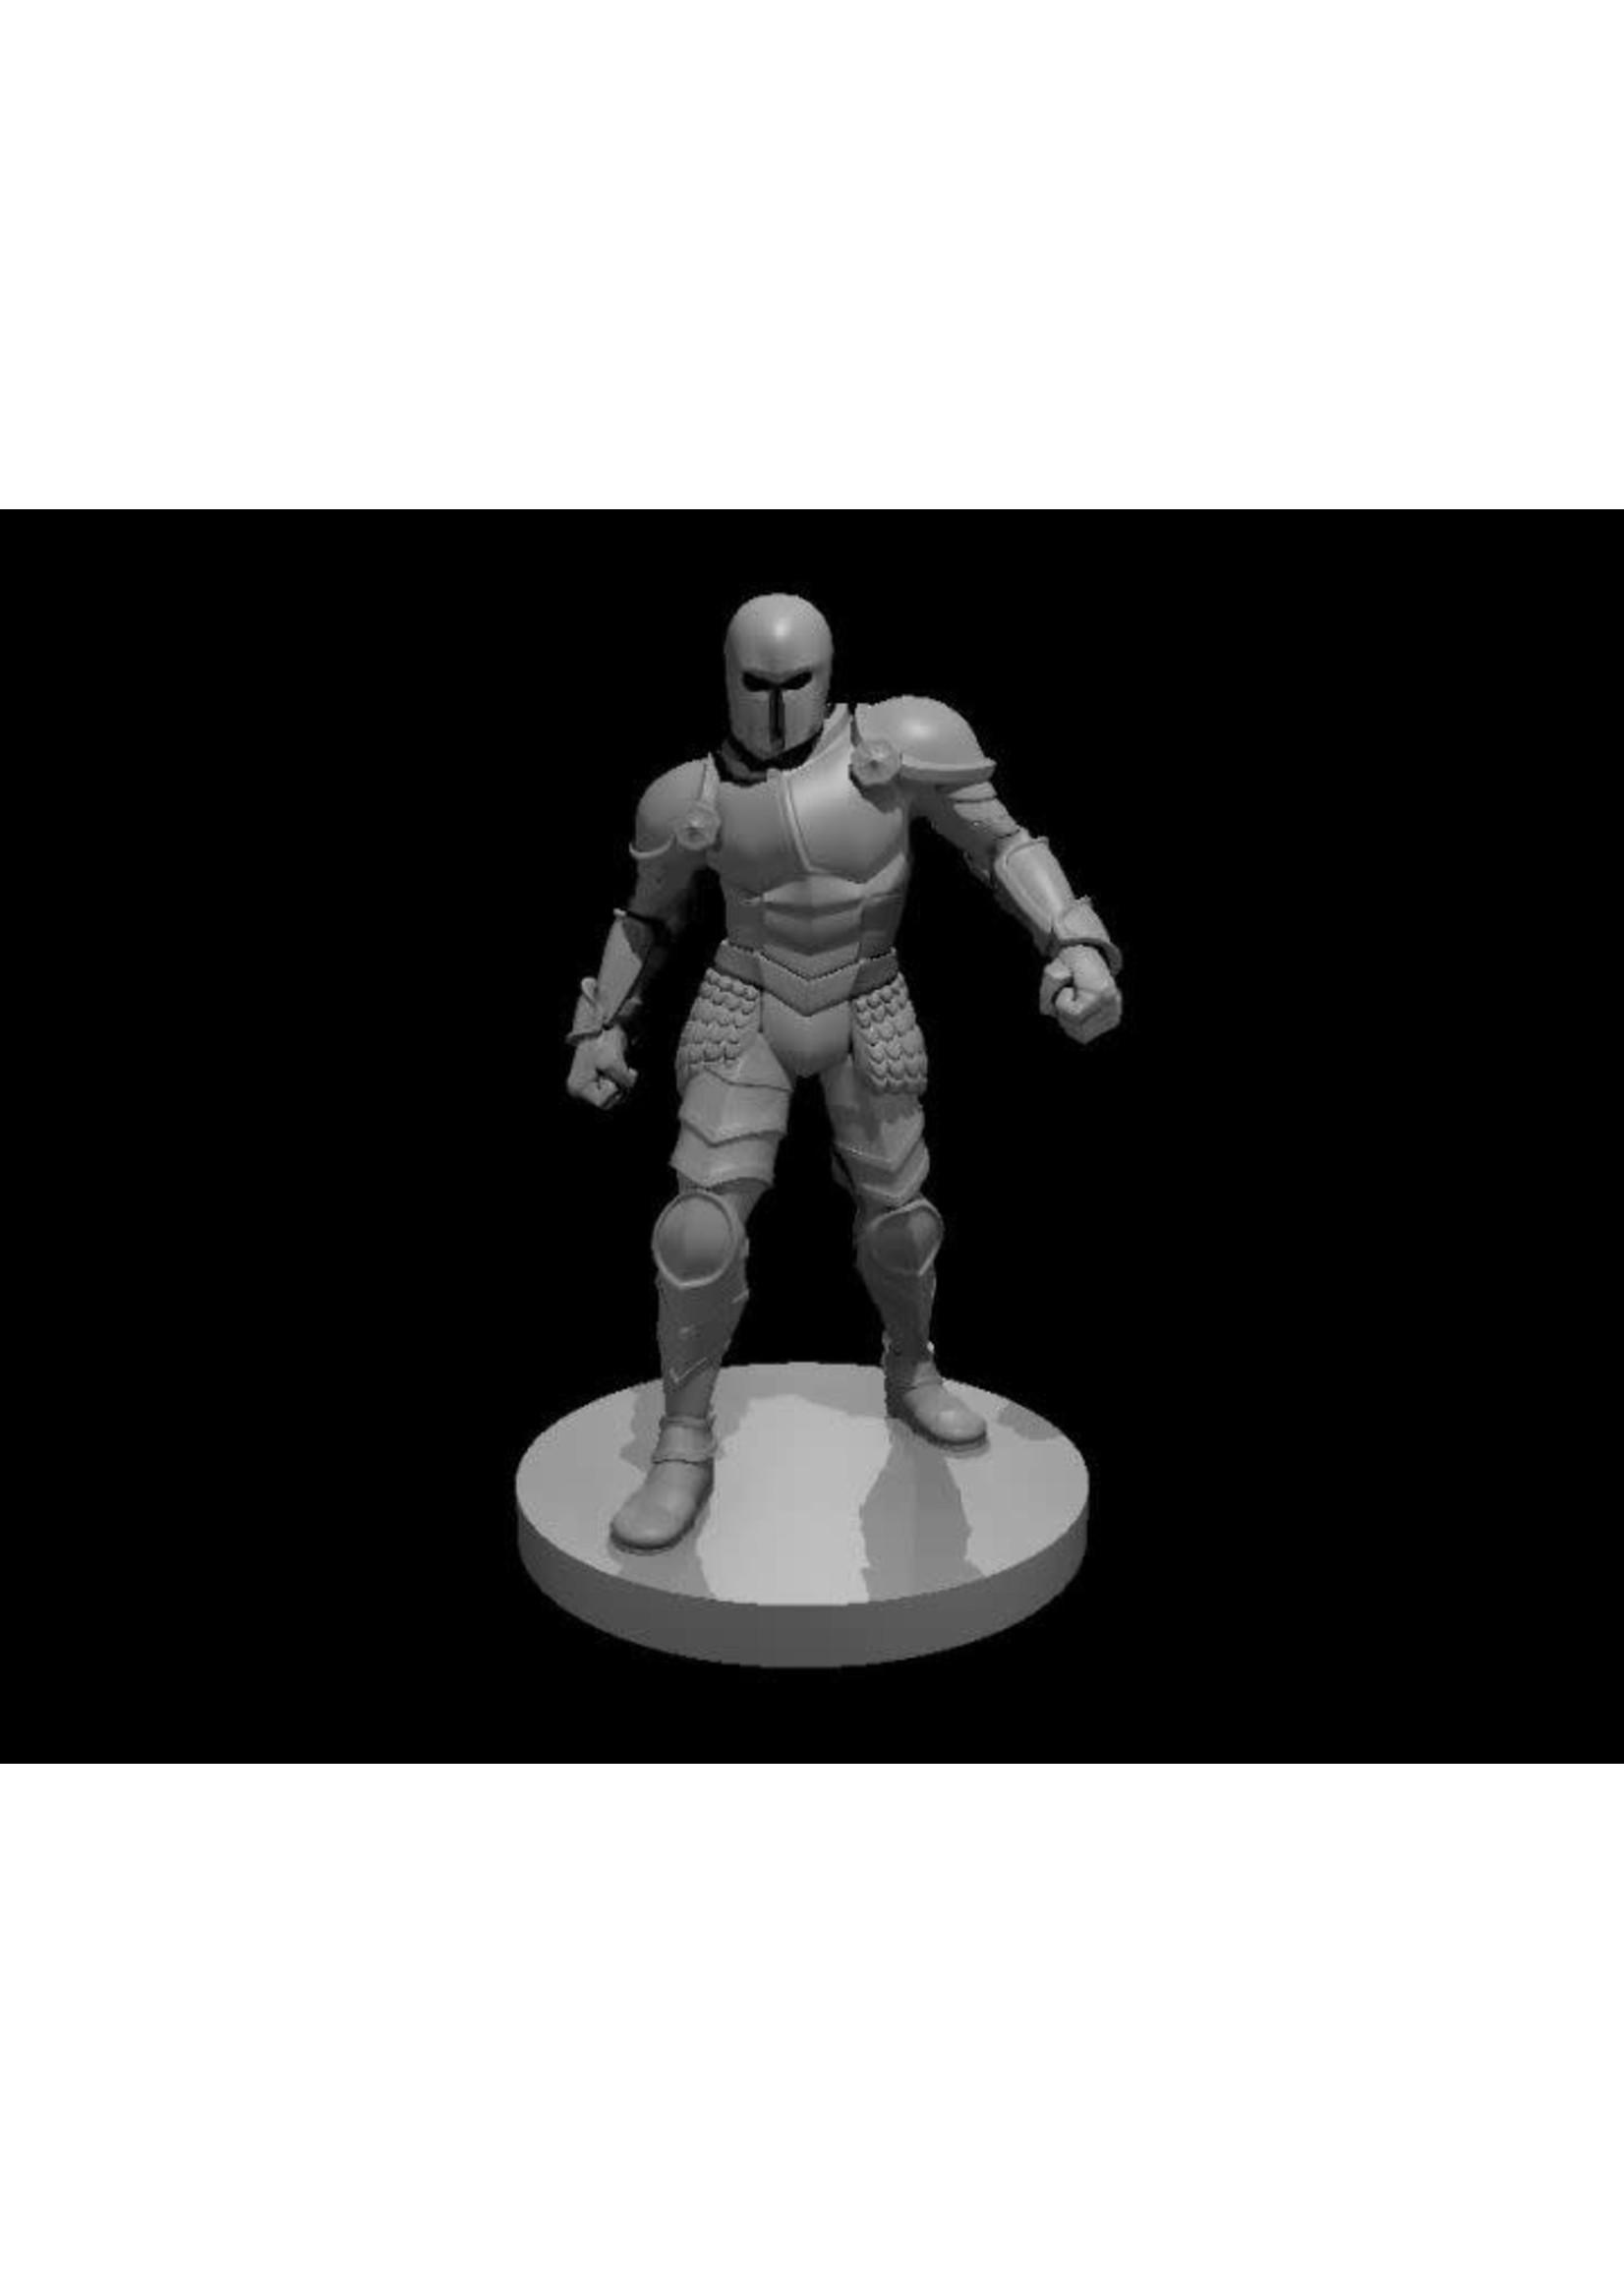 Animated Armor (Patreon Mz4250)